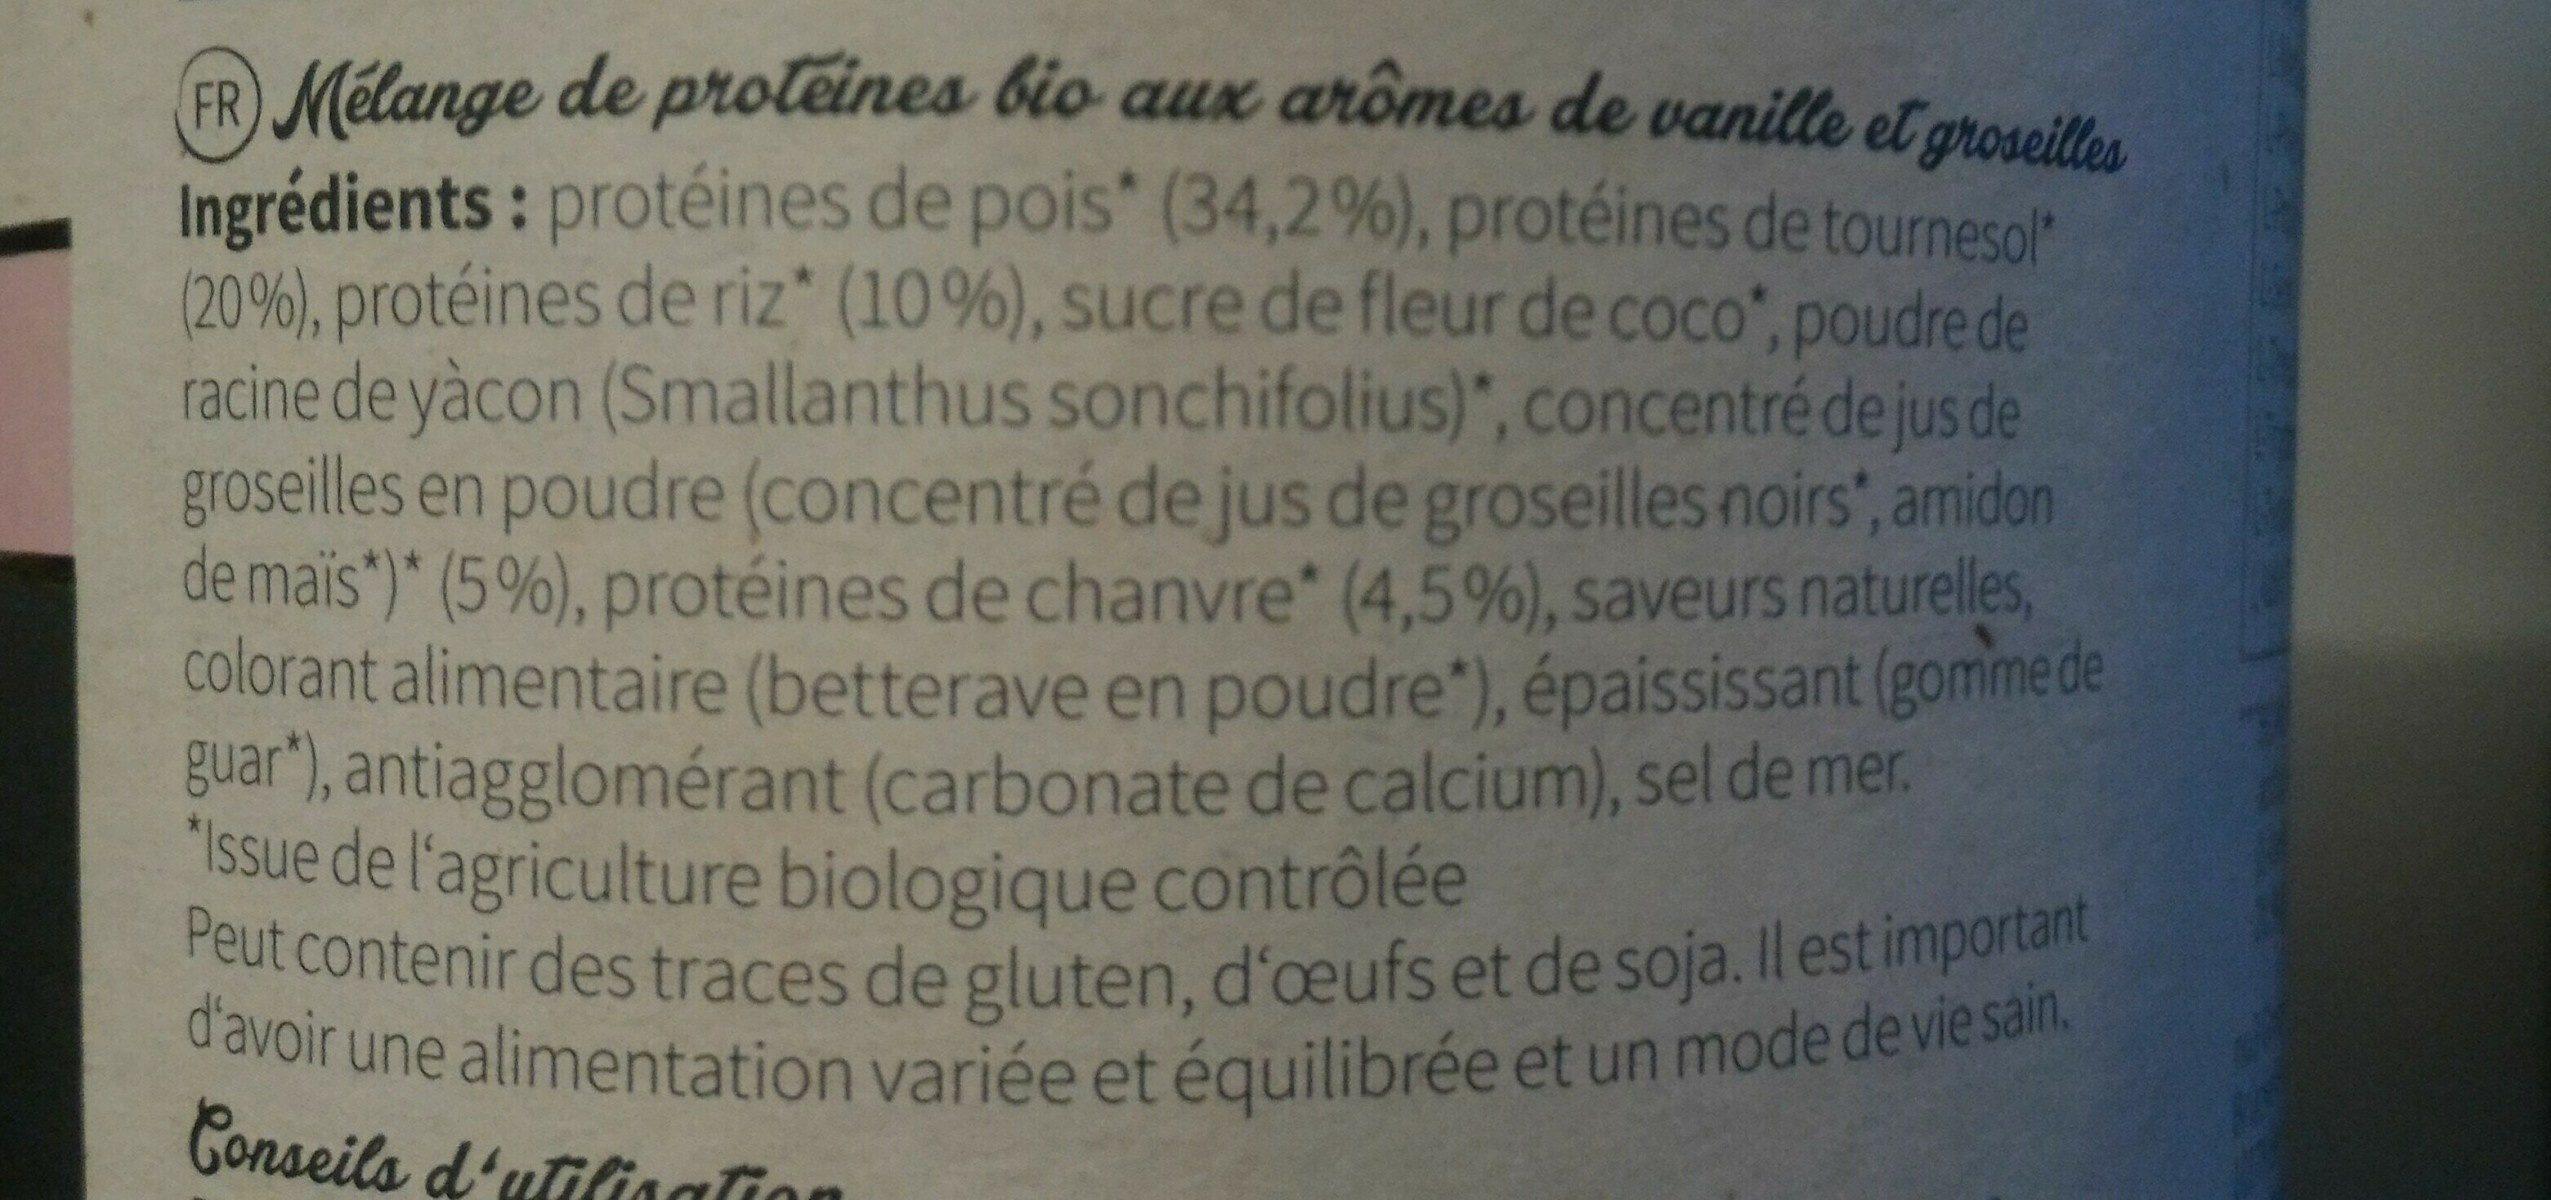 Bio vegan protein shake prenium - Ingredients